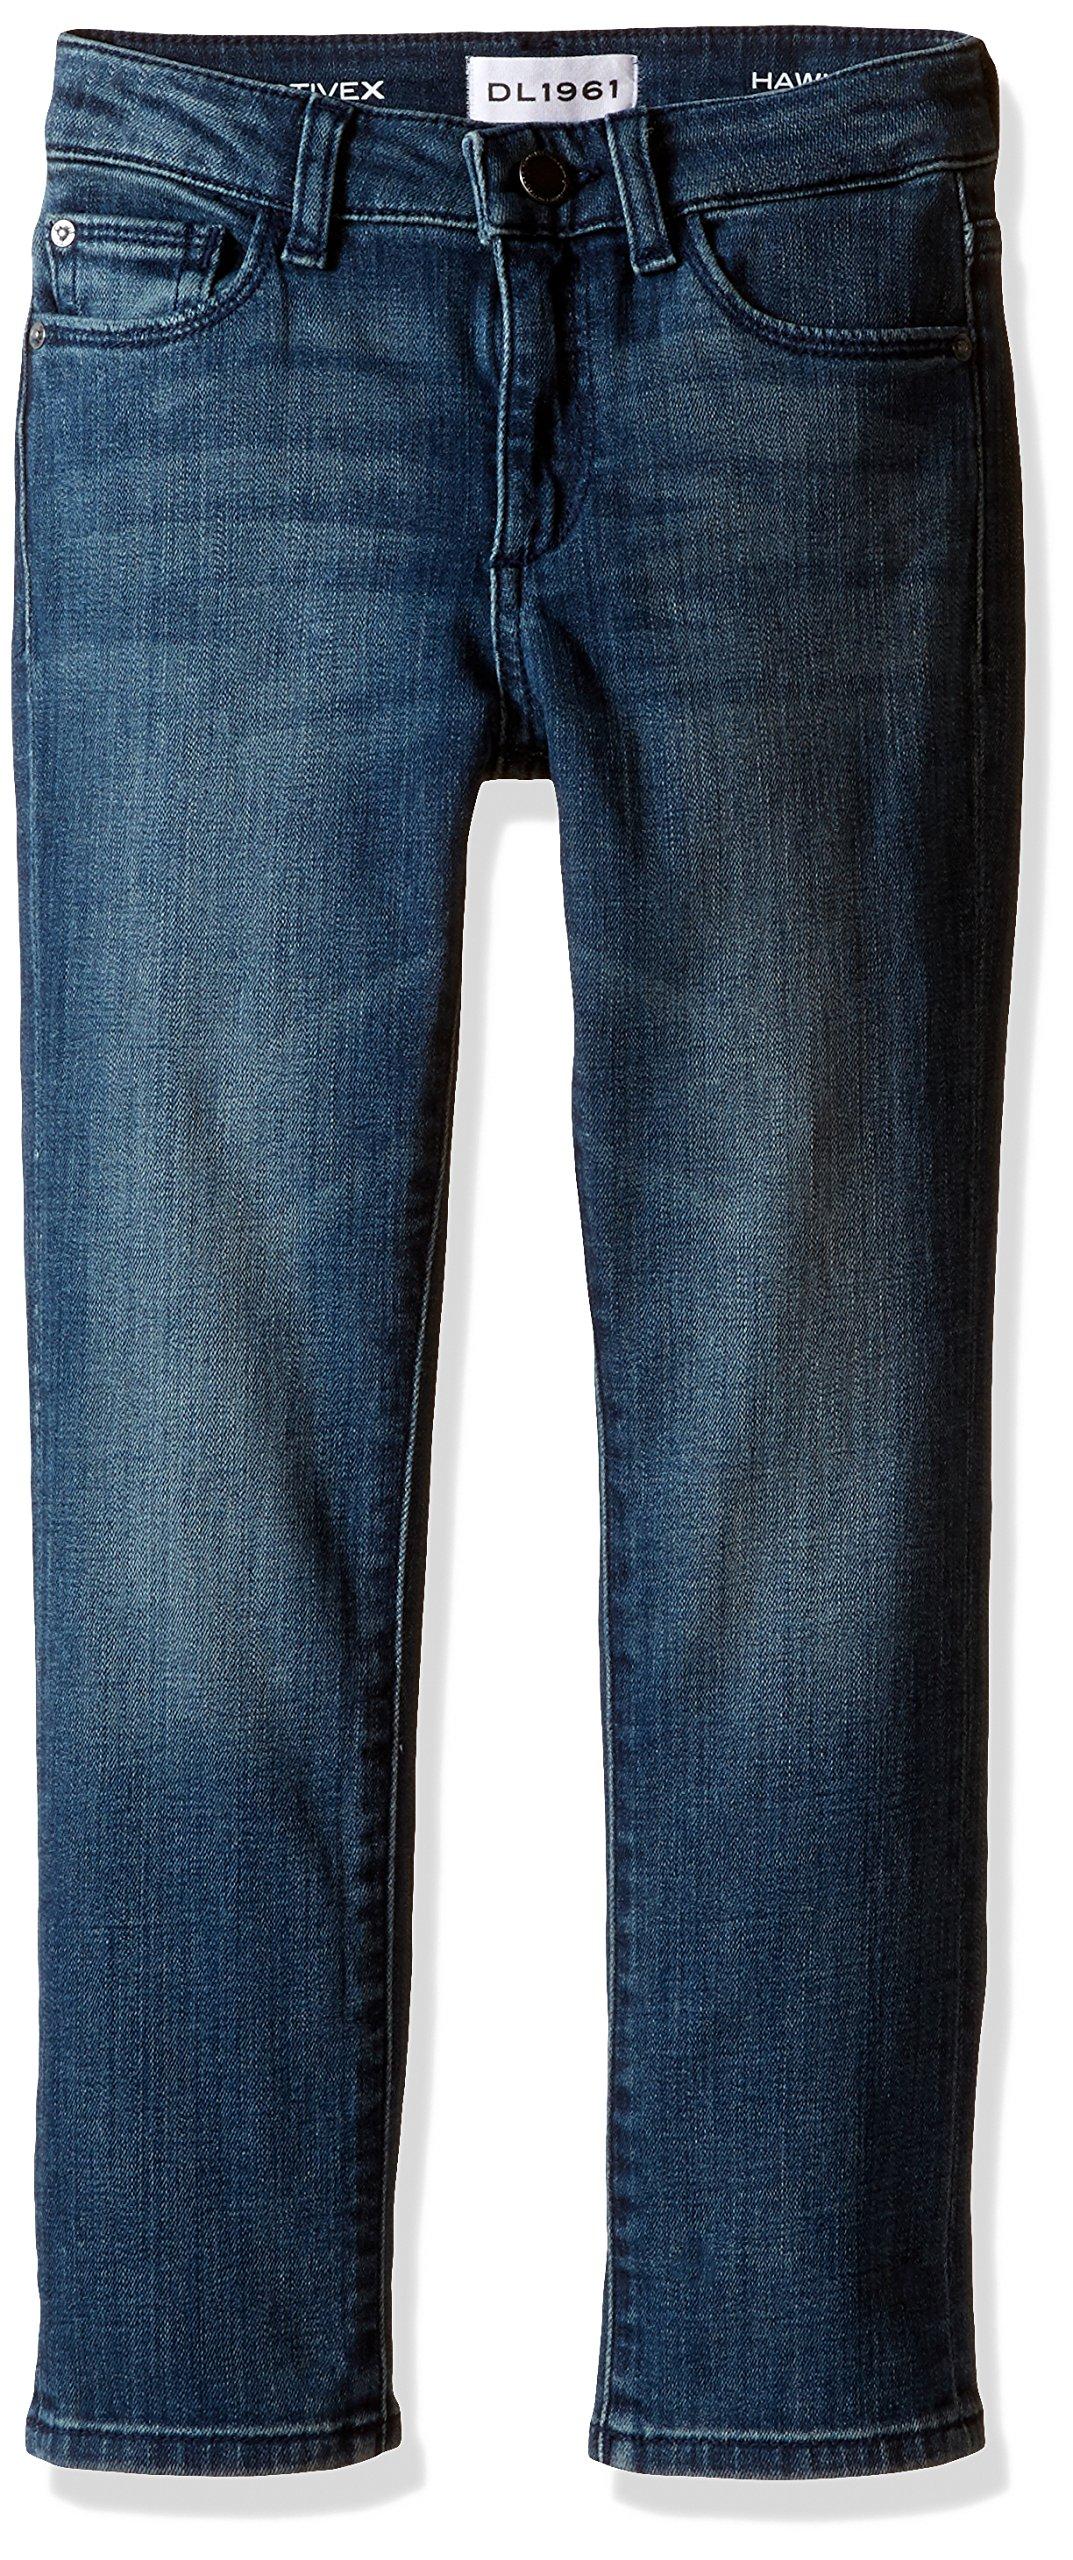 DL 1961 Toddler Boys' Hawke Skinny Jeans, Scabbard, 4